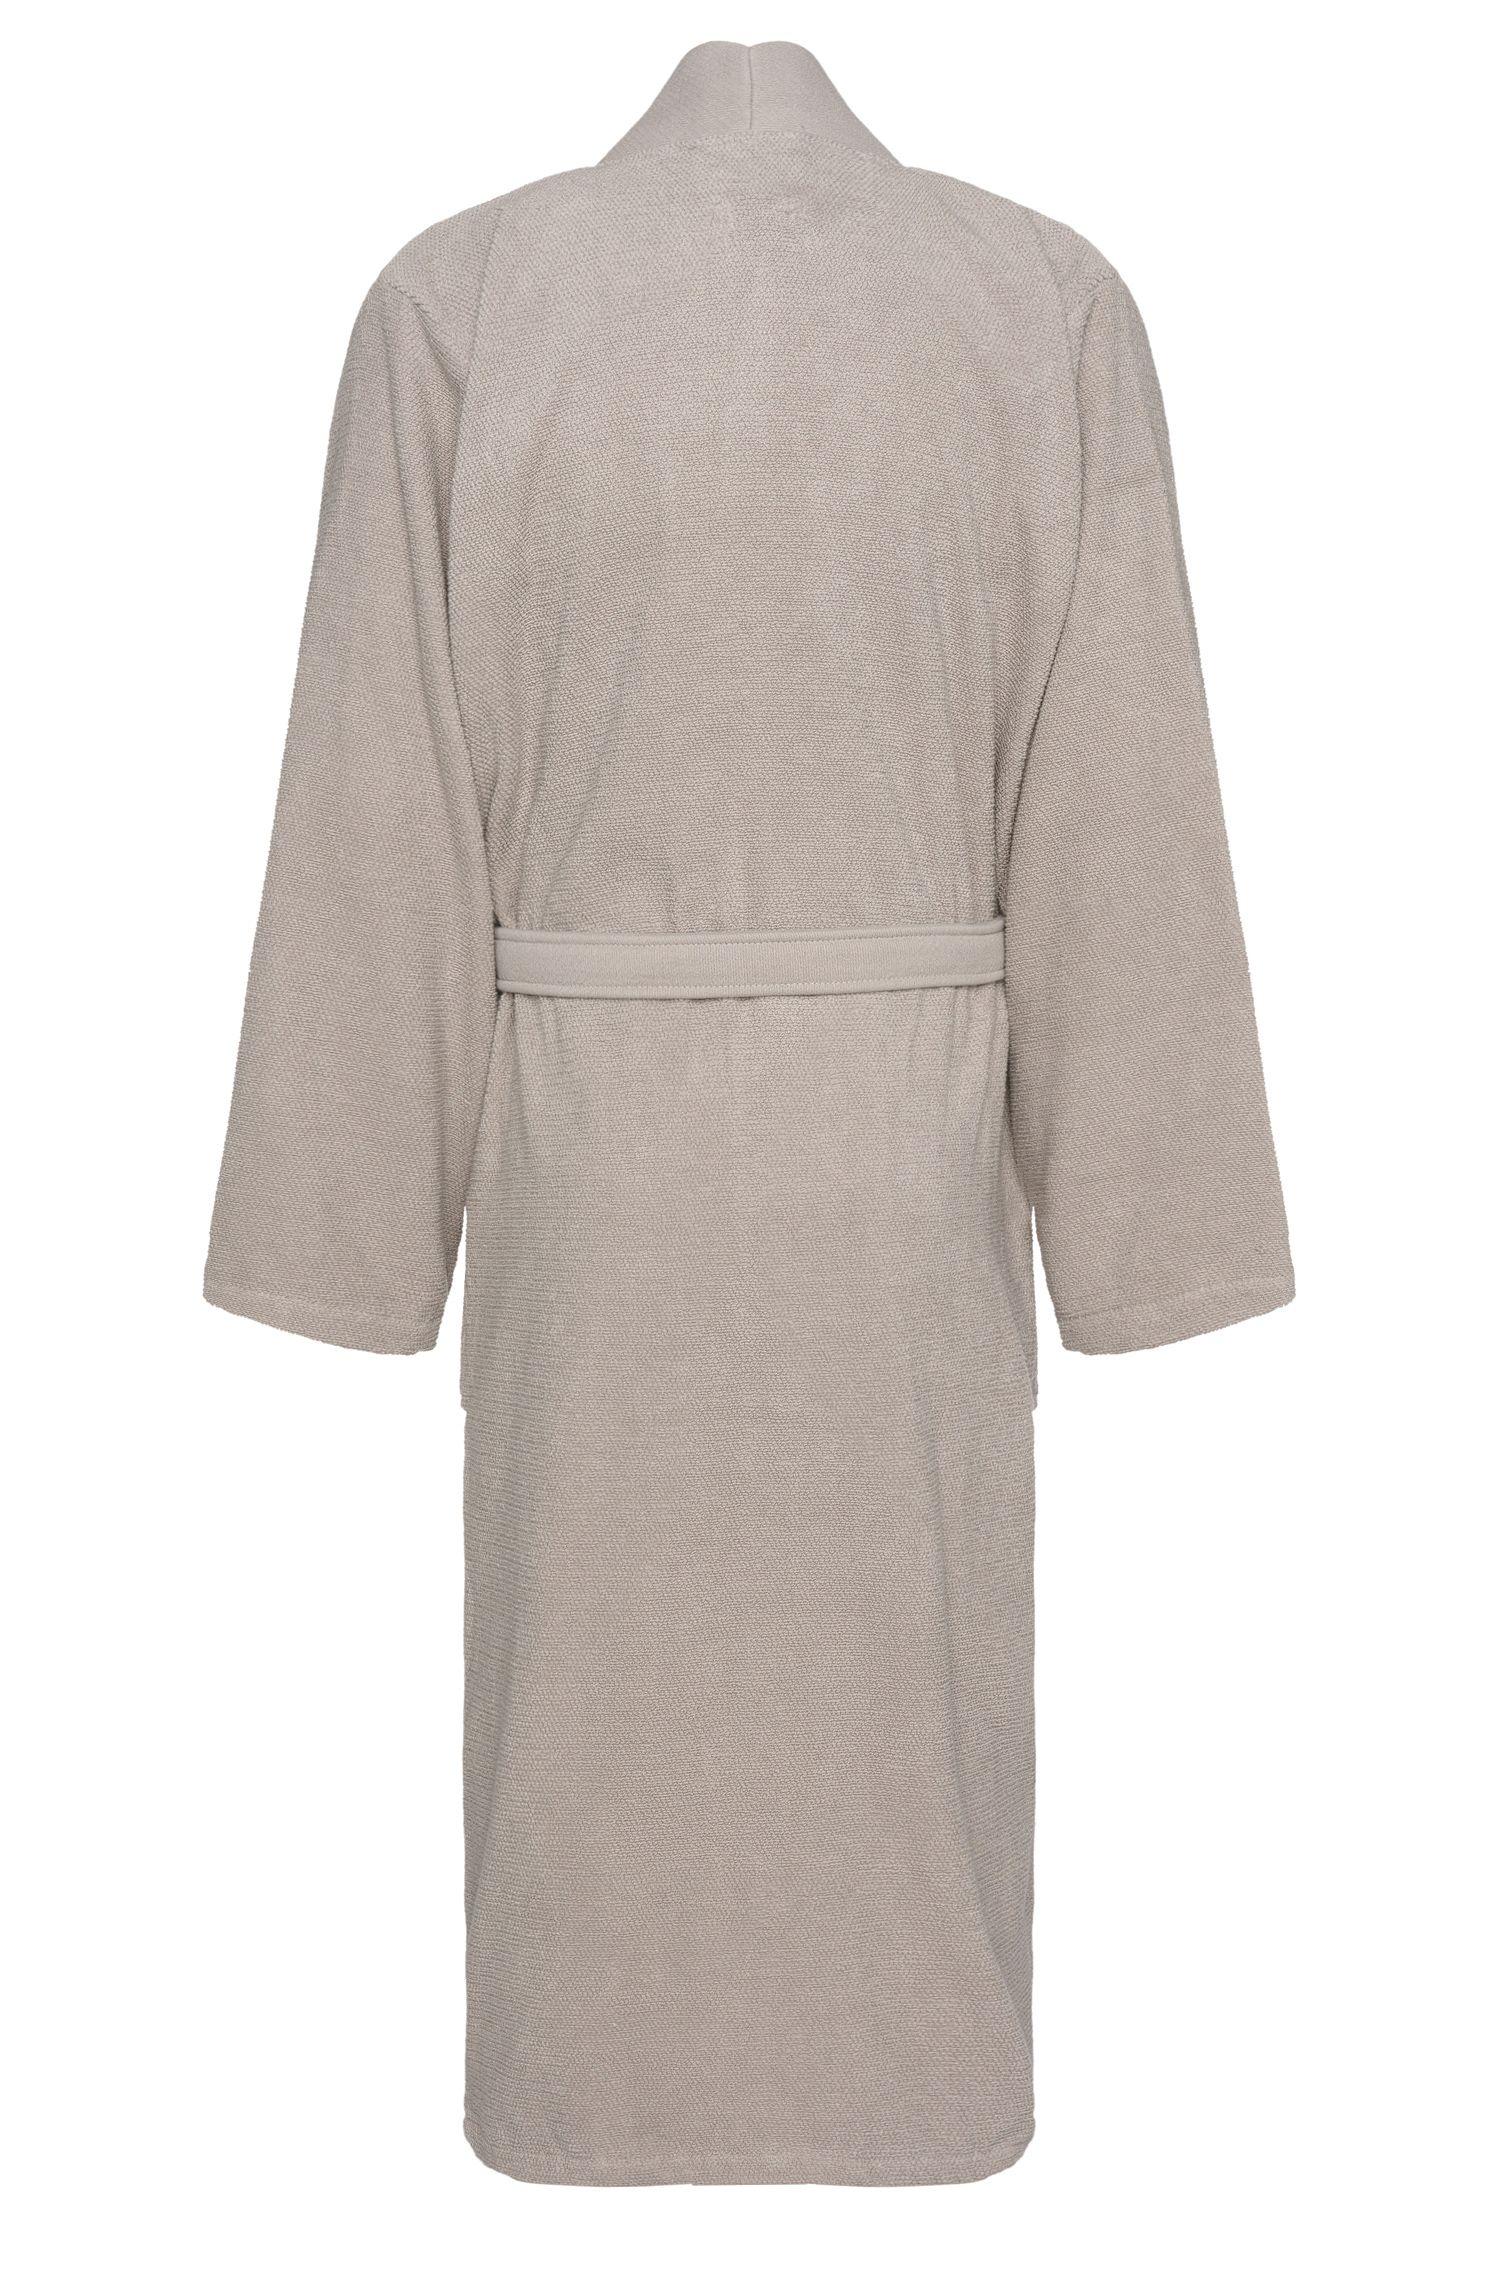 Kimono-style bathrobe in combed Aegean cotton